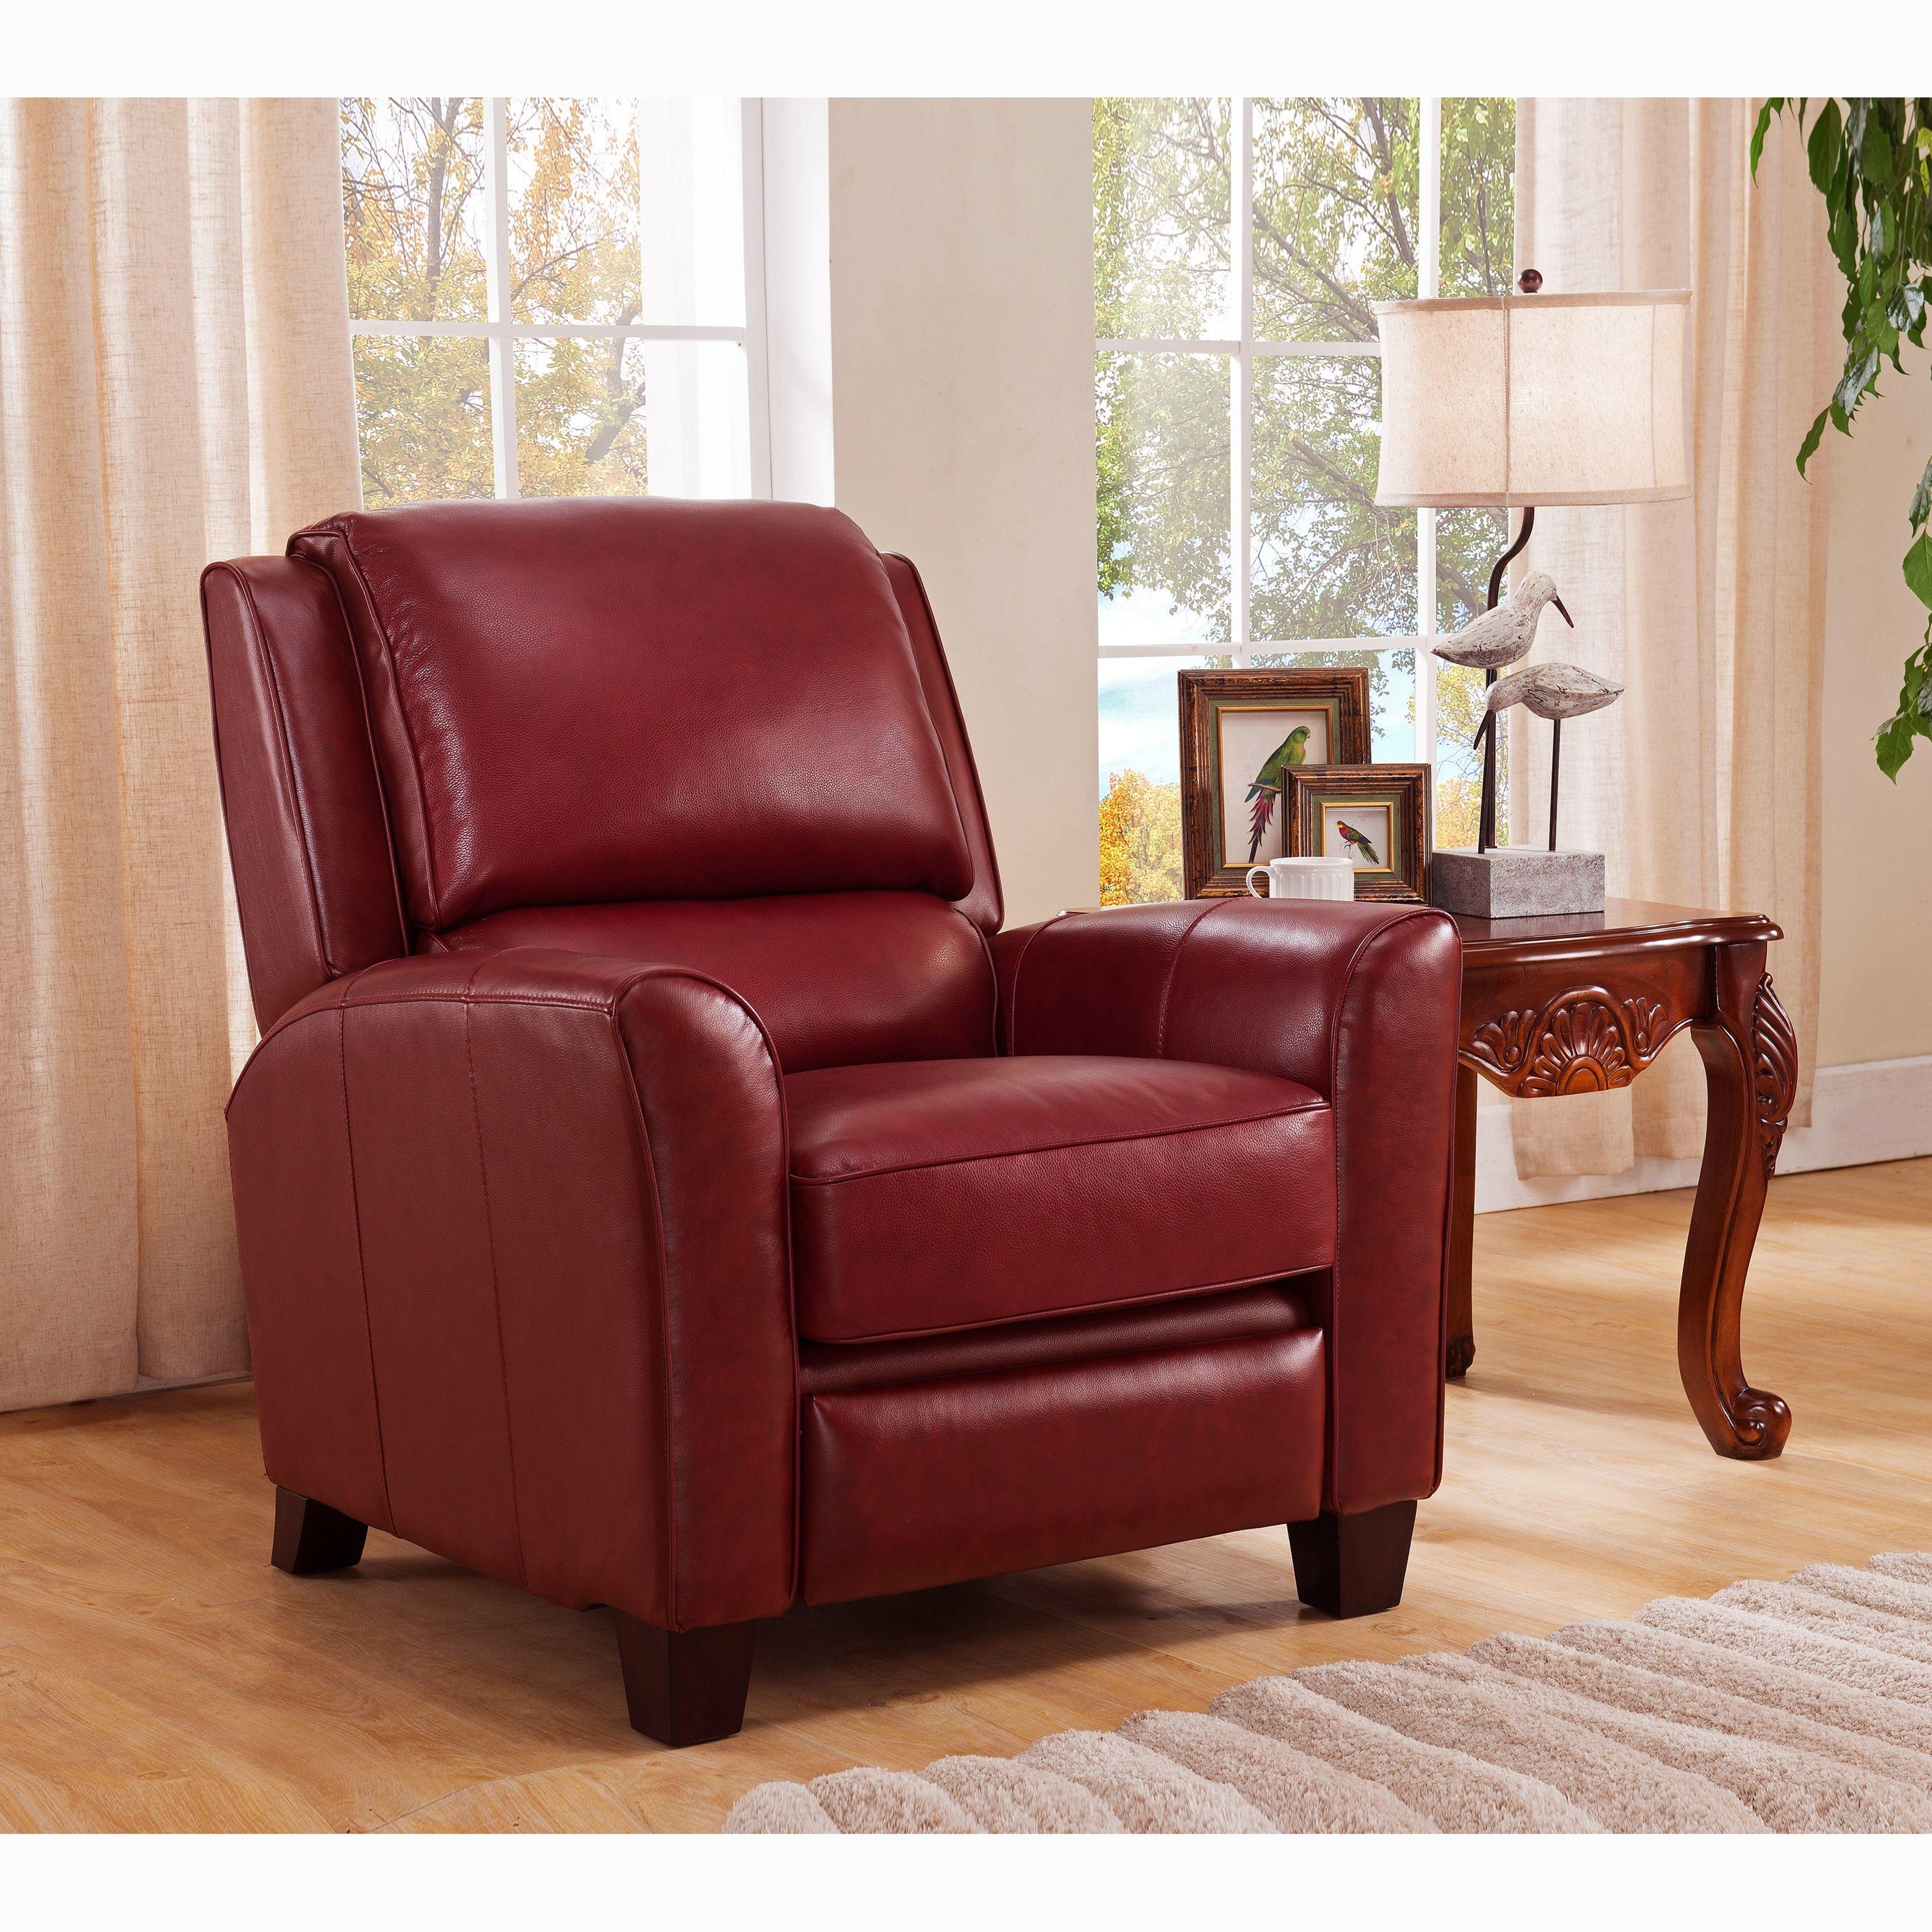 Moderne Sessel Leder Stunning With Moderne Sessel Leder